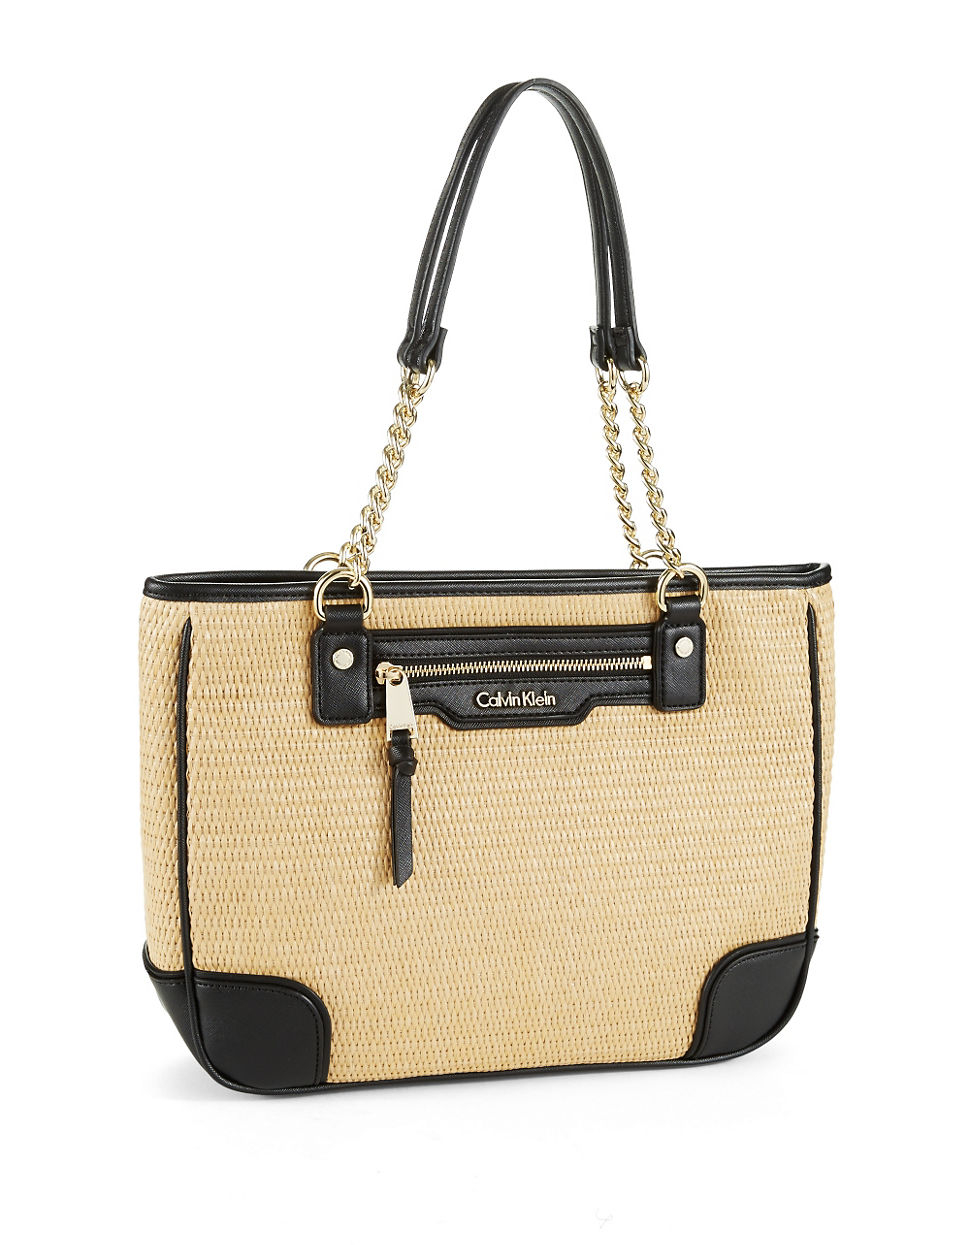 summer handbags calvin klein straw handbags. Black Bedroom Furniture Sets. Home Design Ideas